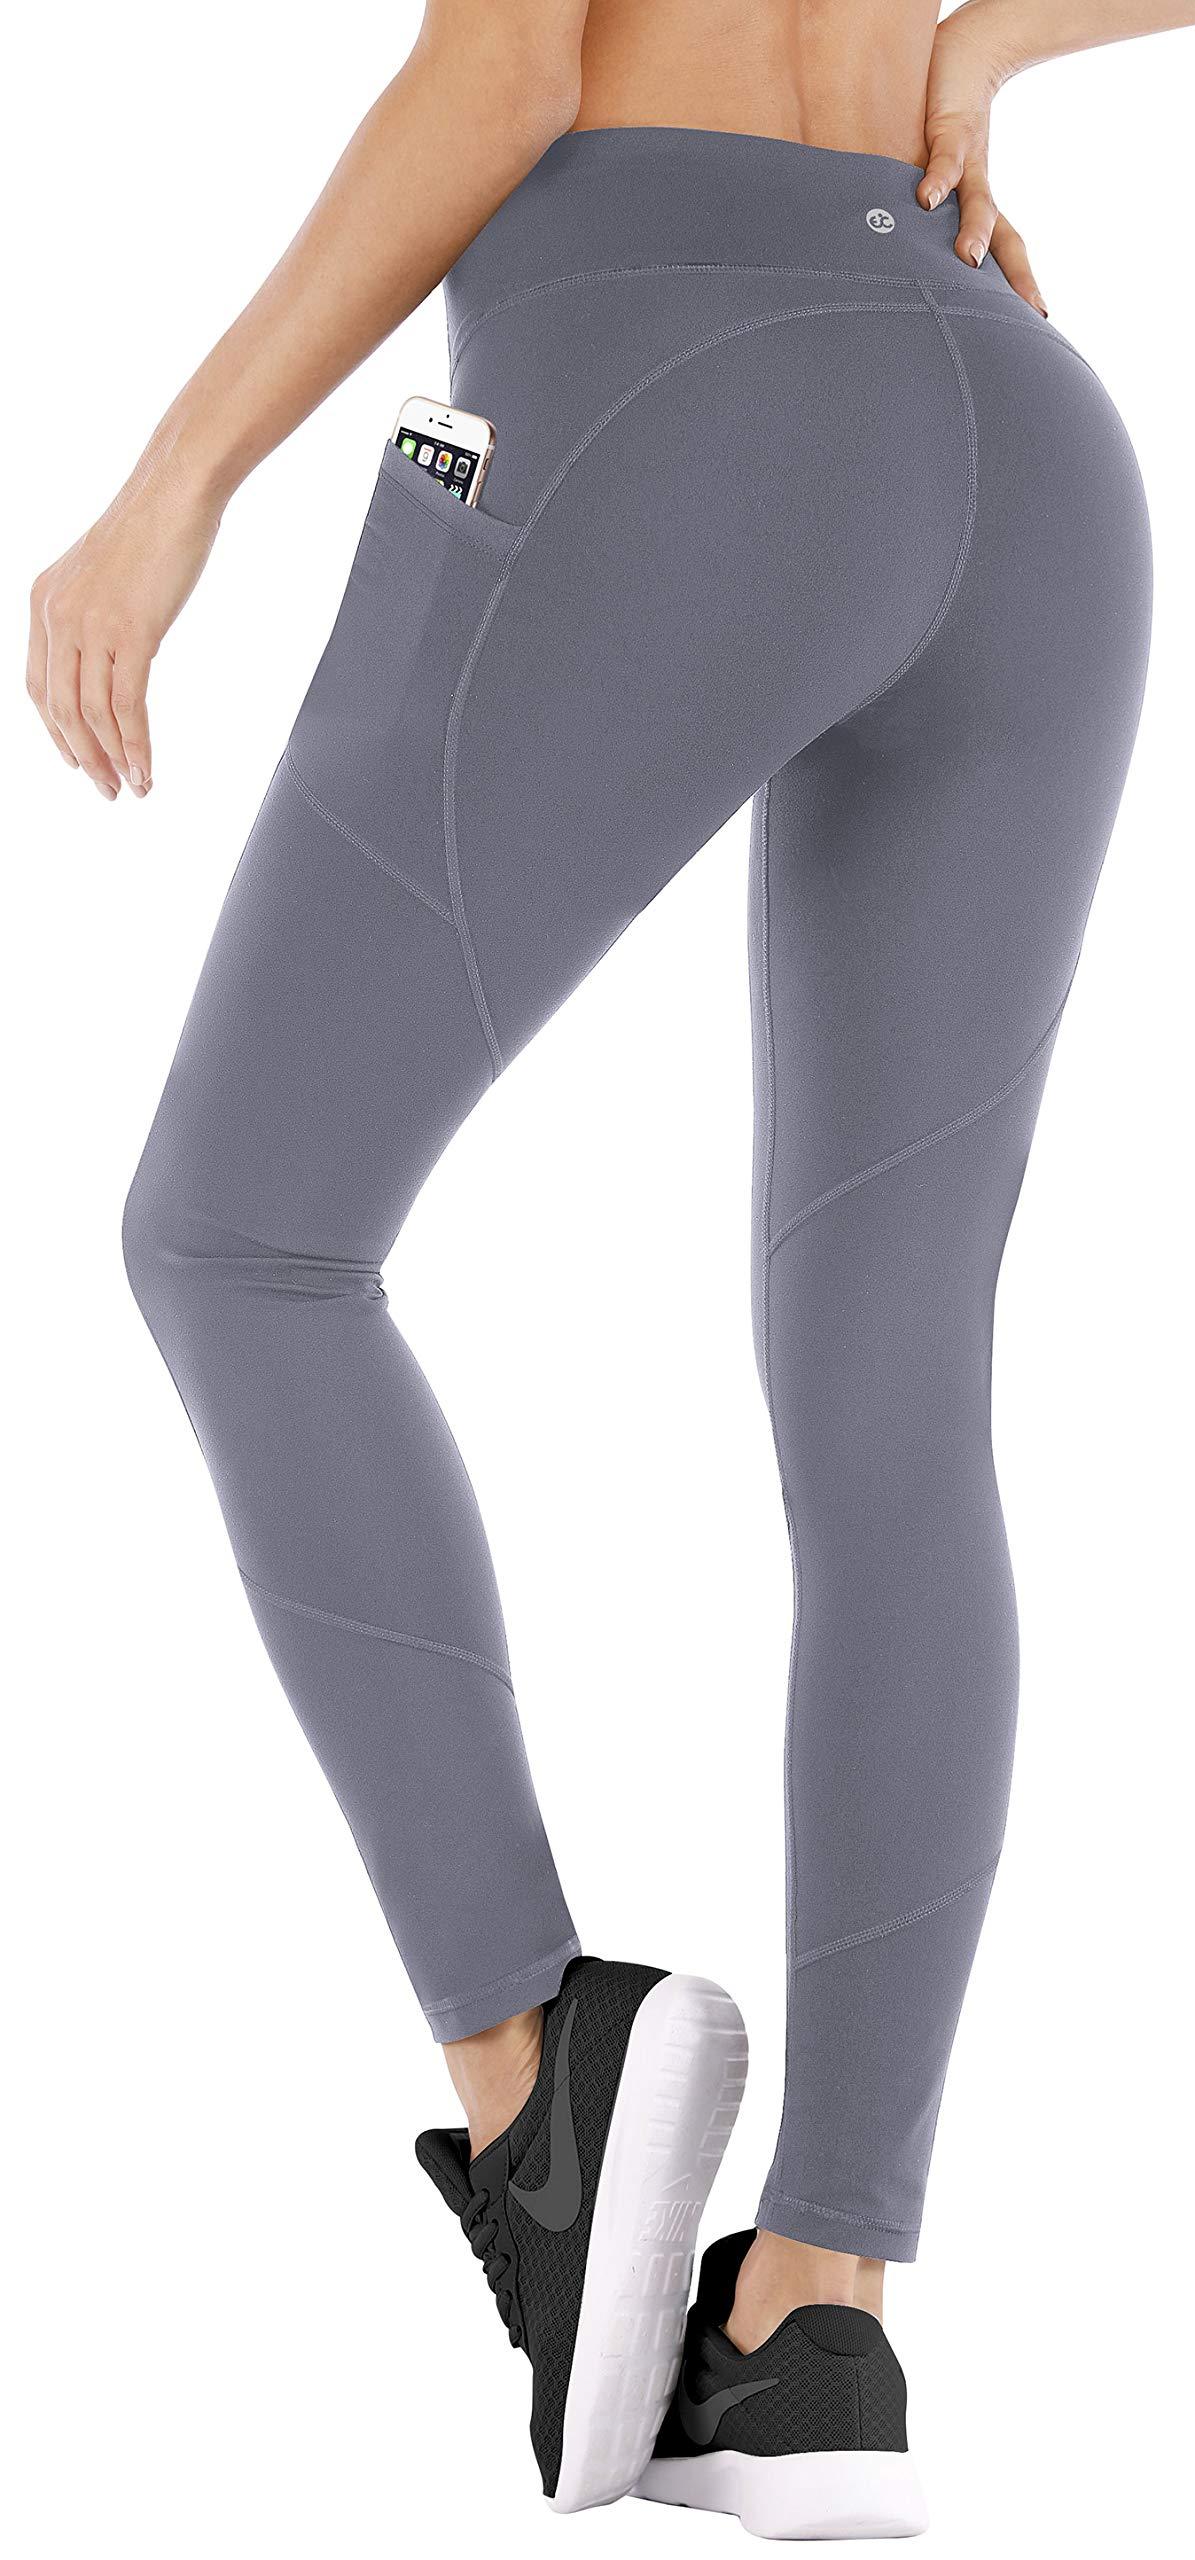 Ewedoos Yoga Pants with Pockets for Women Ultra Soft Leggings with Pockets High Waist Workout Pants (Ew330 Gray, X-Large) by Ewedoos